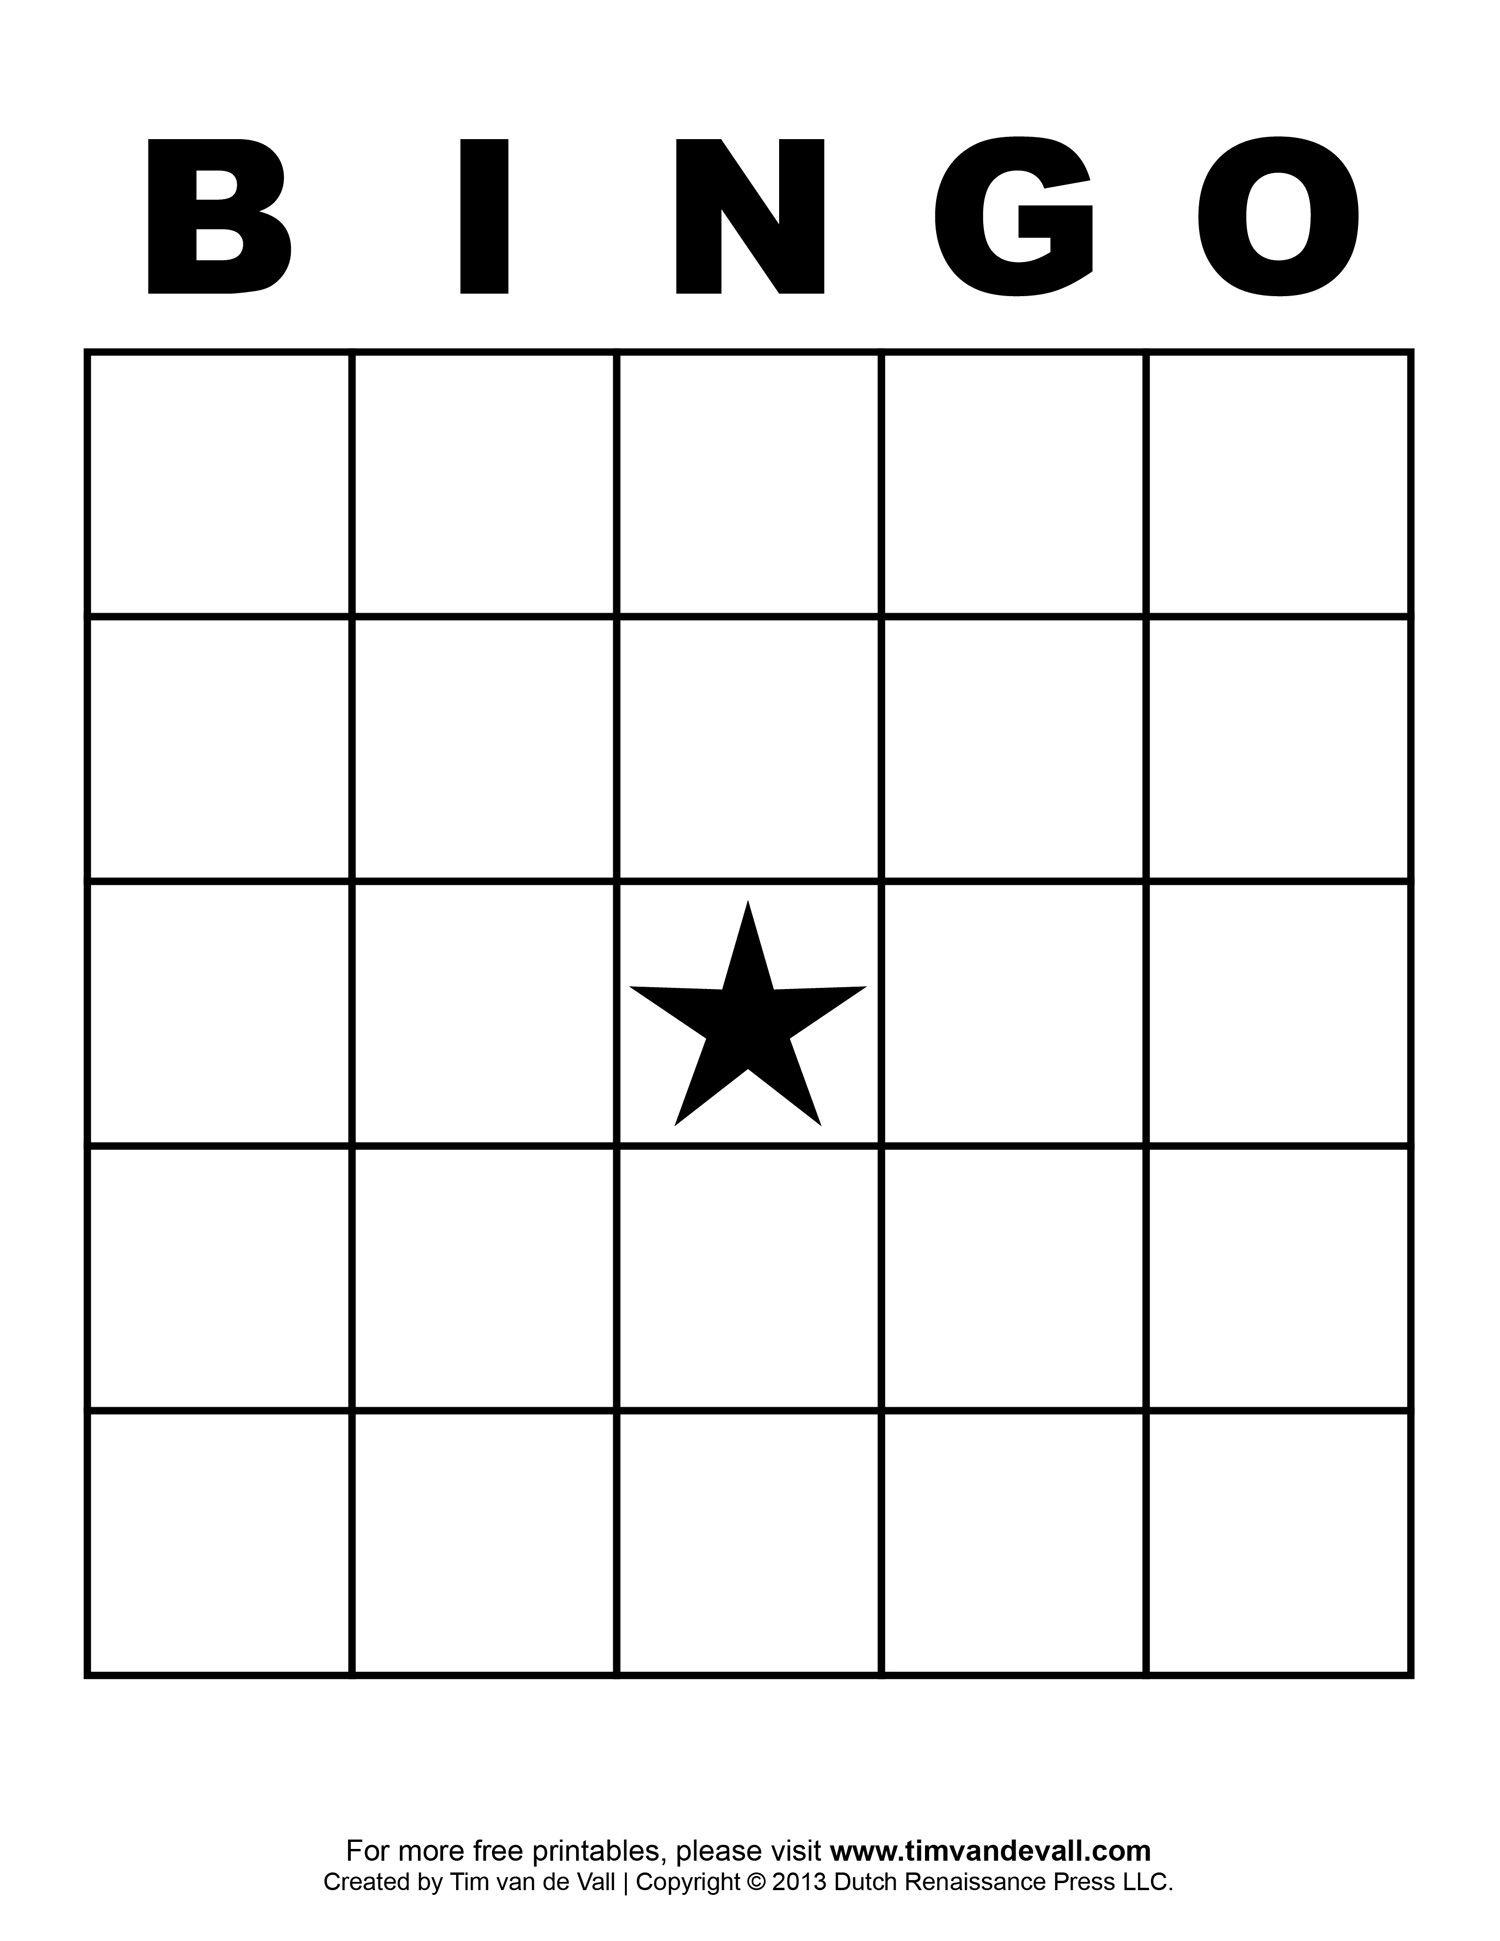 Free Printable Blank Bingo Cards Template 4 X 4 | Classroom | Blank - Free Printable Bingo